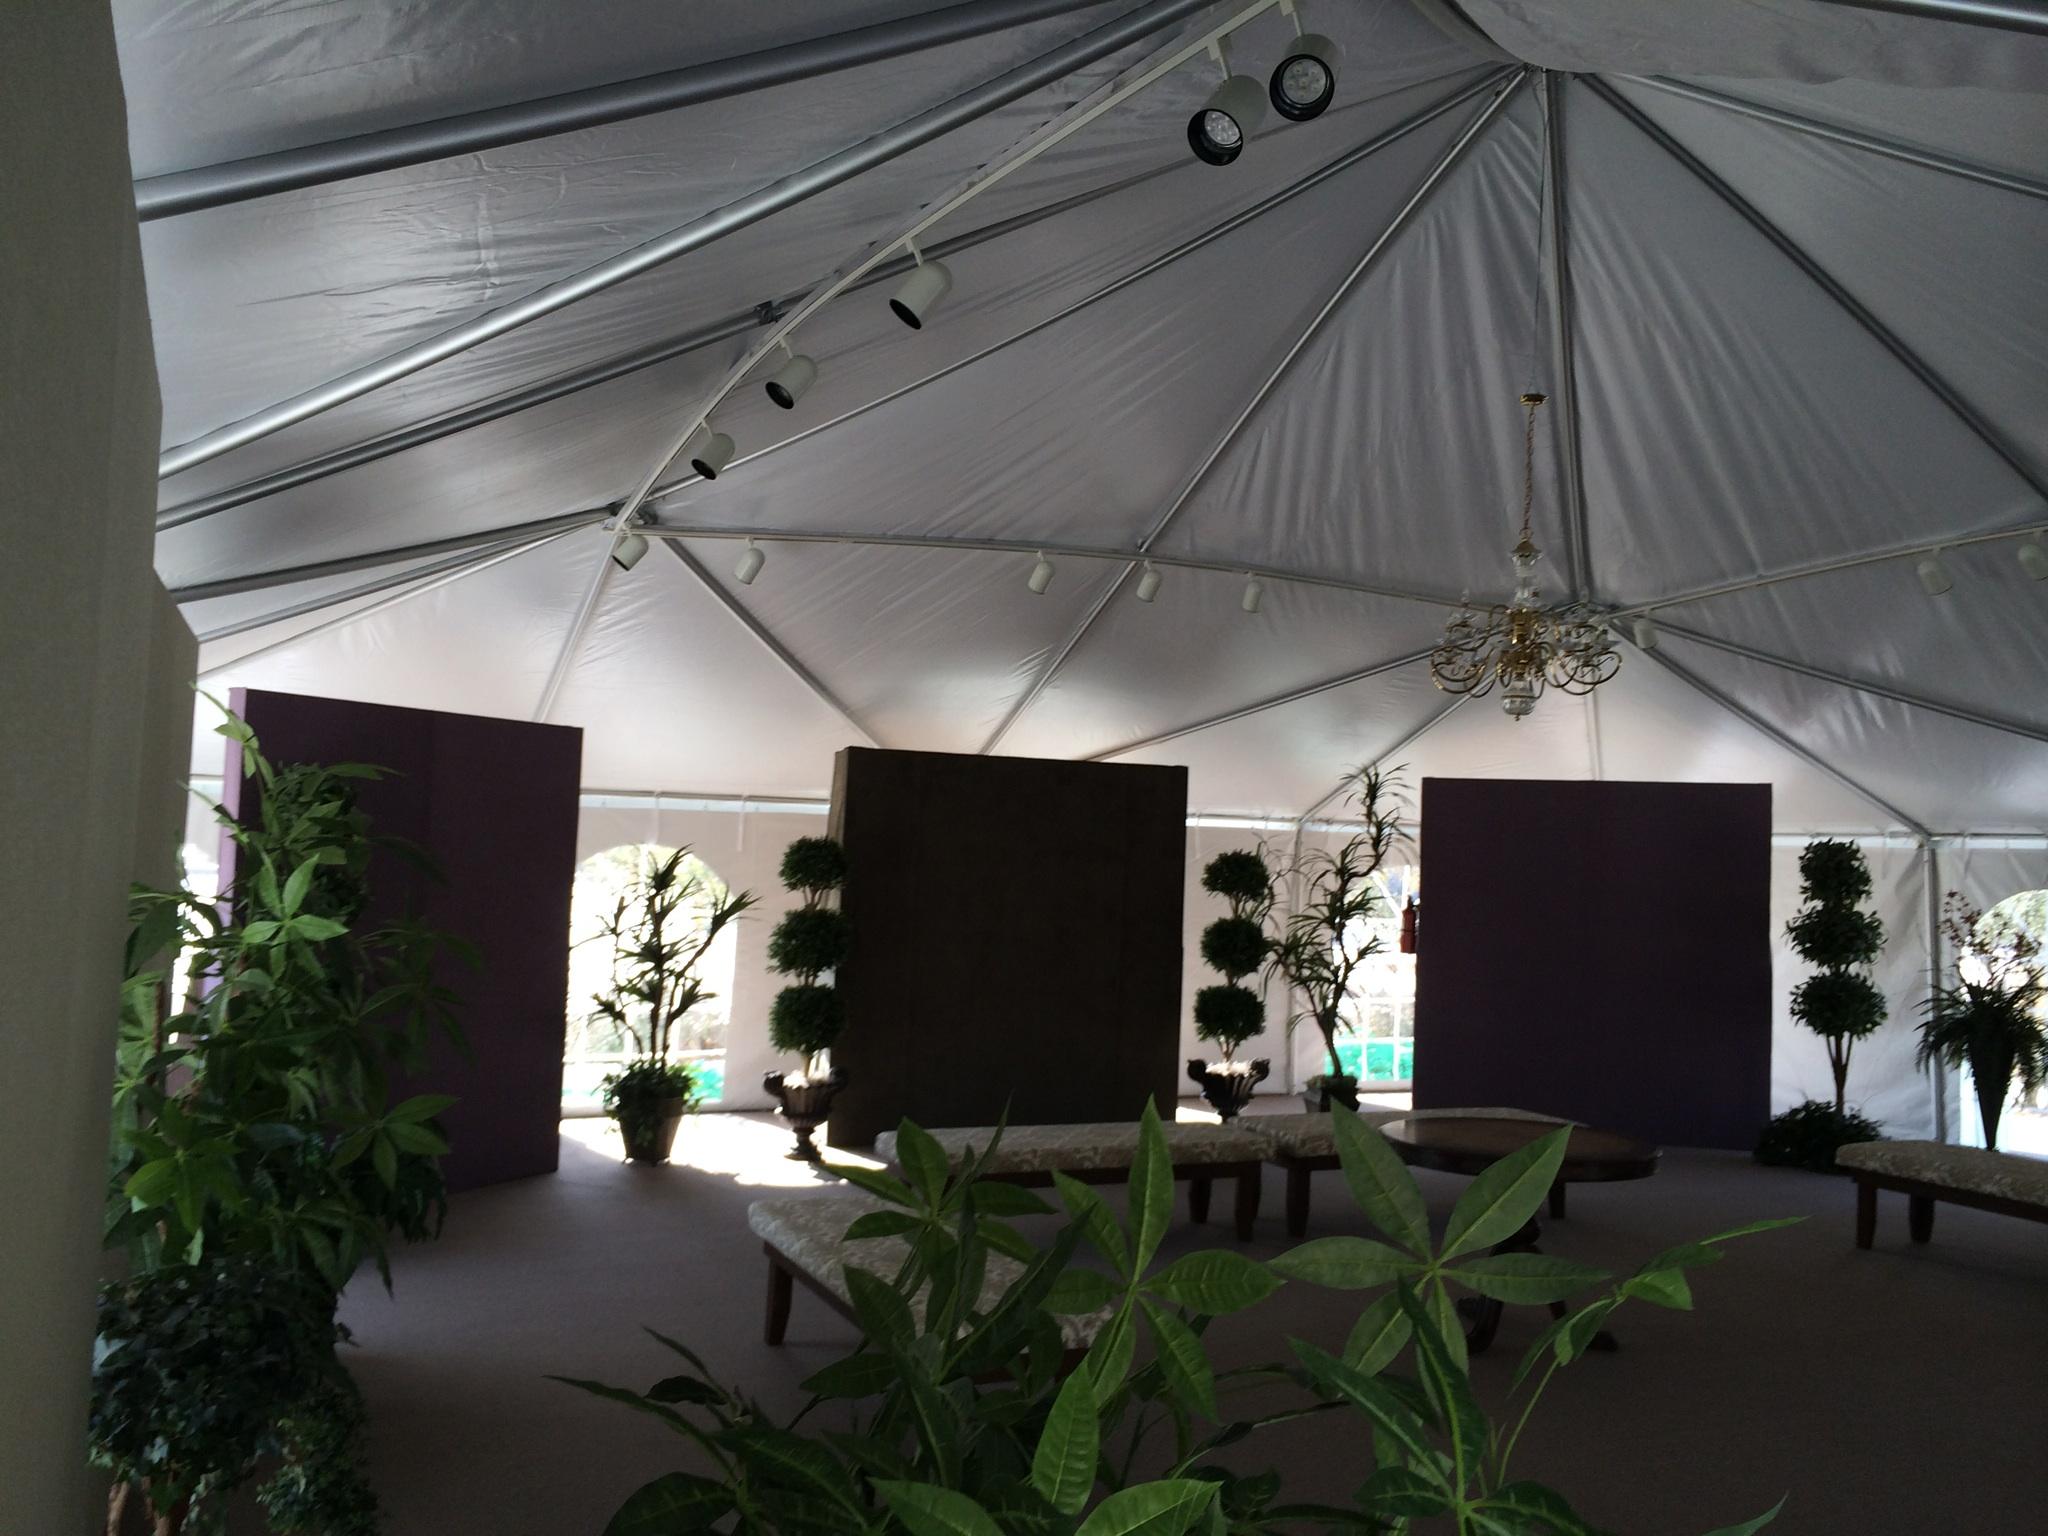 40 x 40 Tent